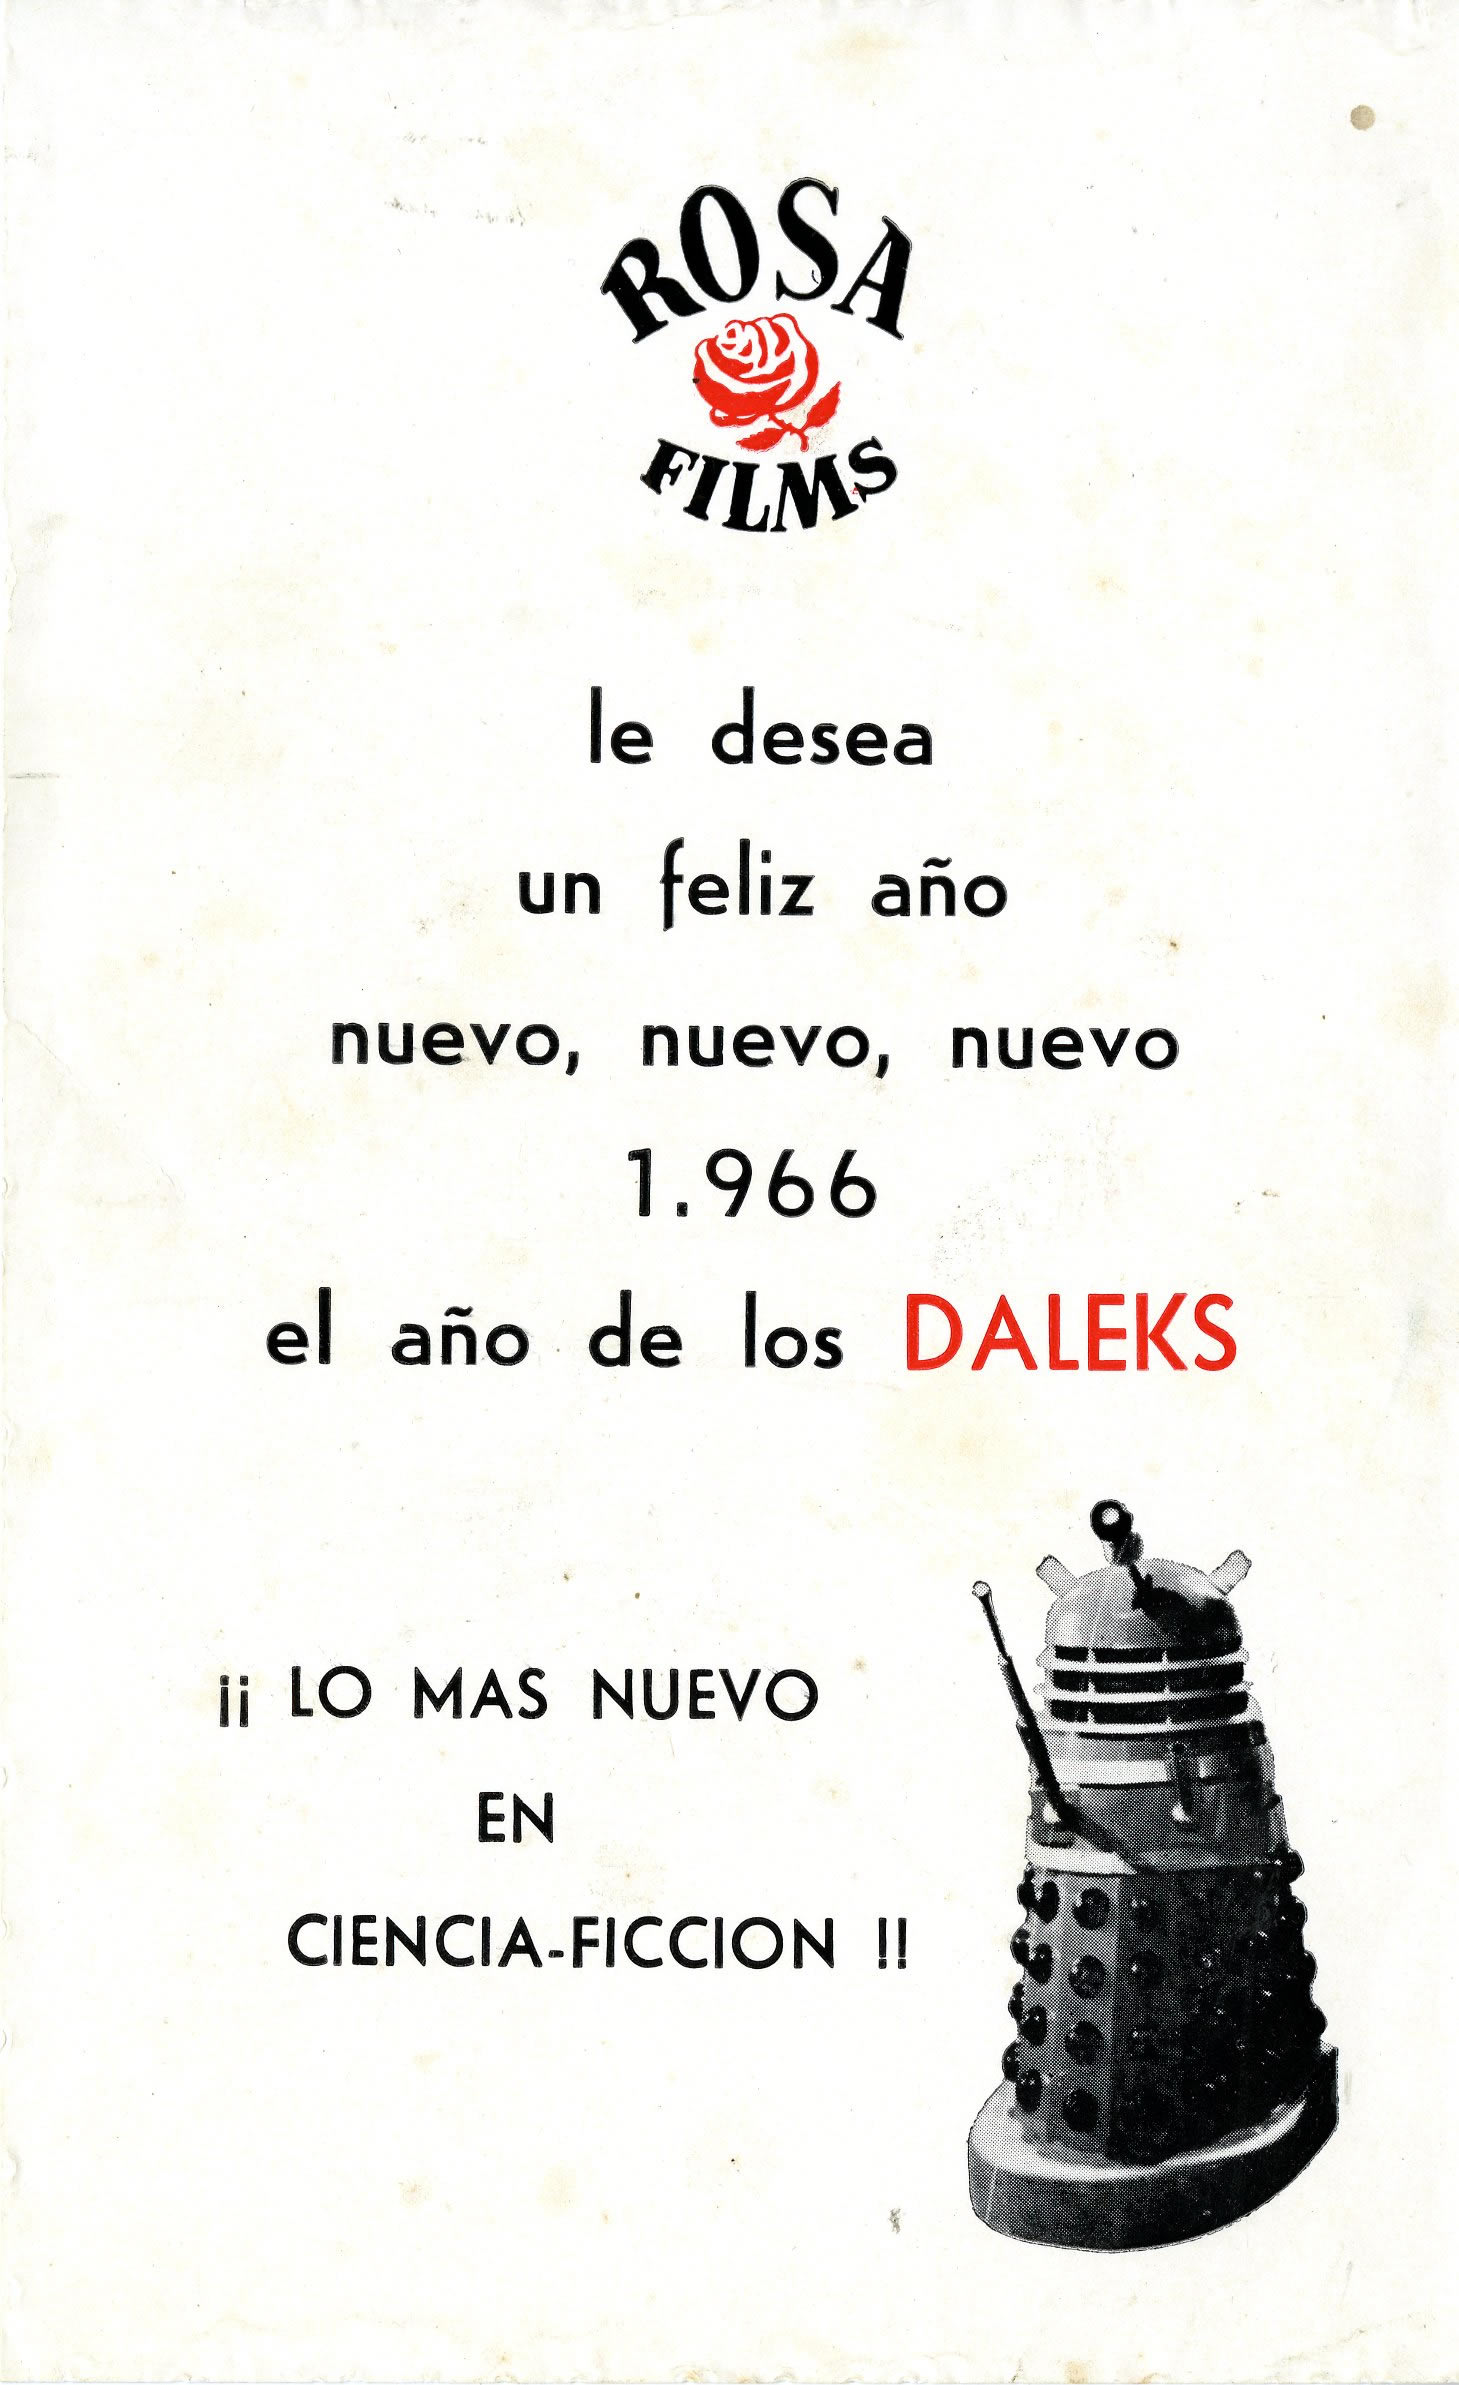 Spanish promotional flier